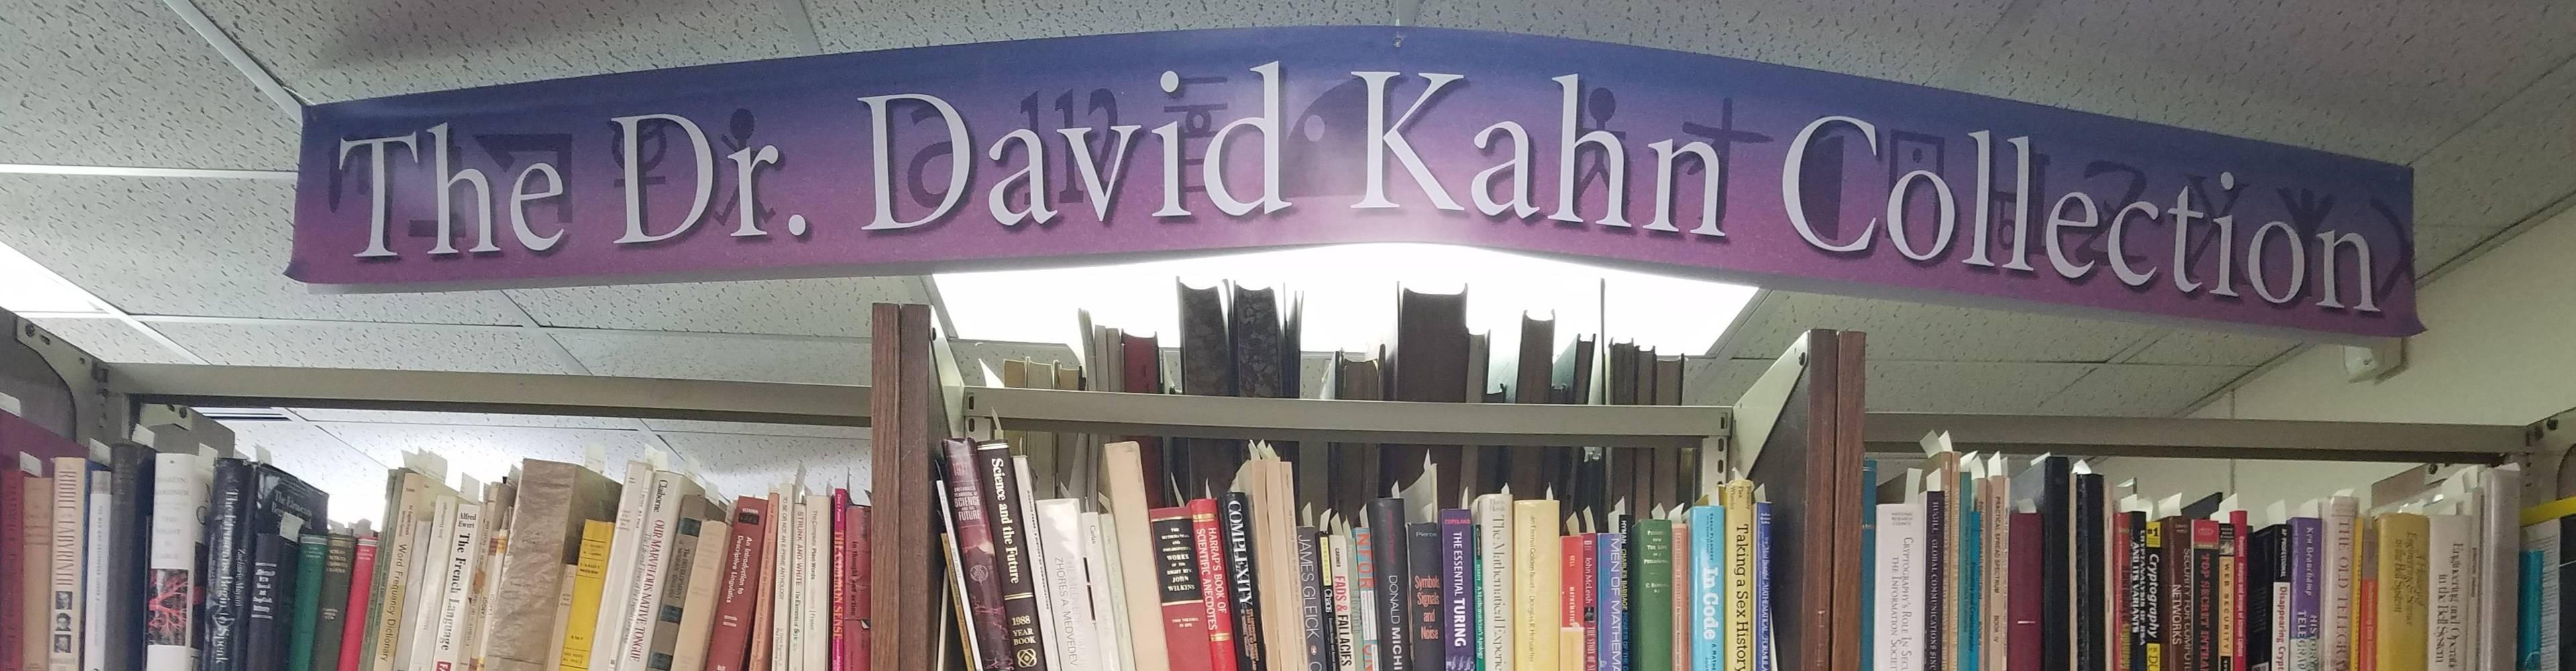 virmuze exhibit The Dr. David Kahn Collection logo main banner